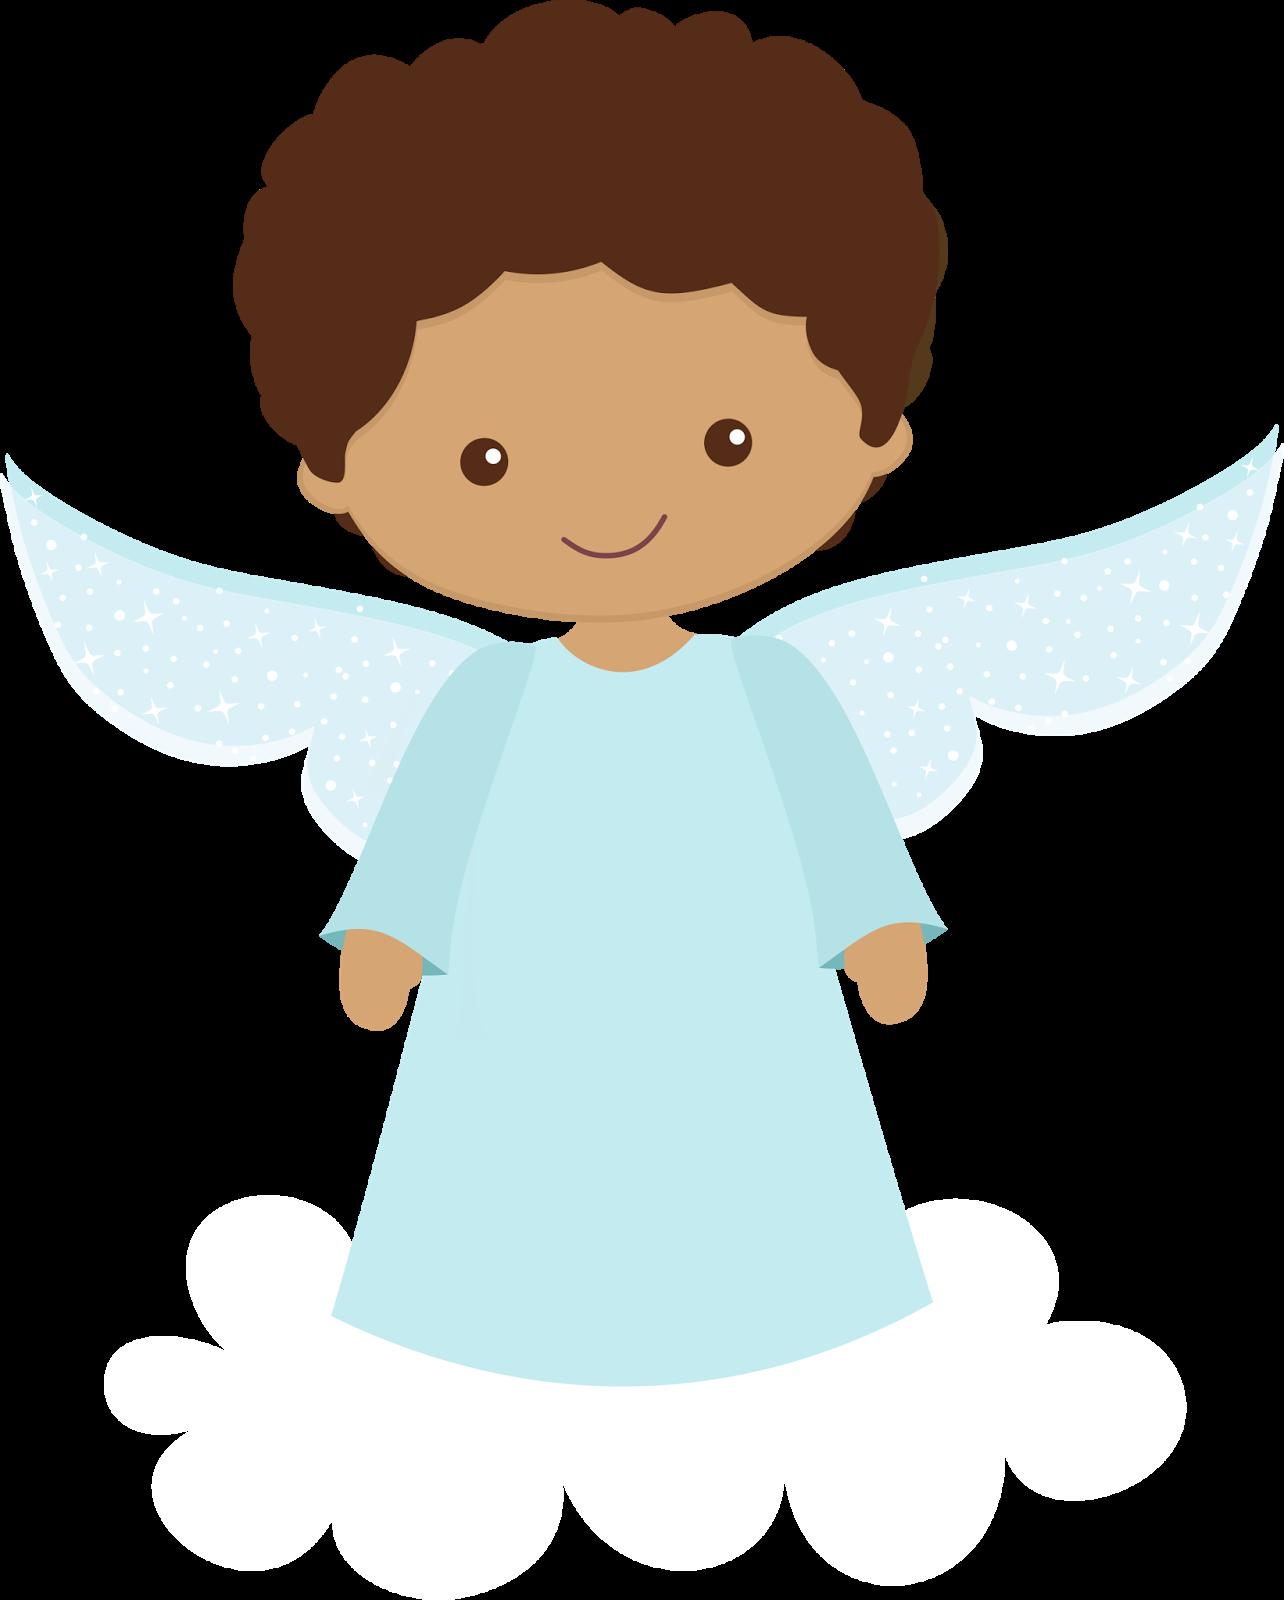 Anjos Png Anjo Png Anjos Anjos Batizado